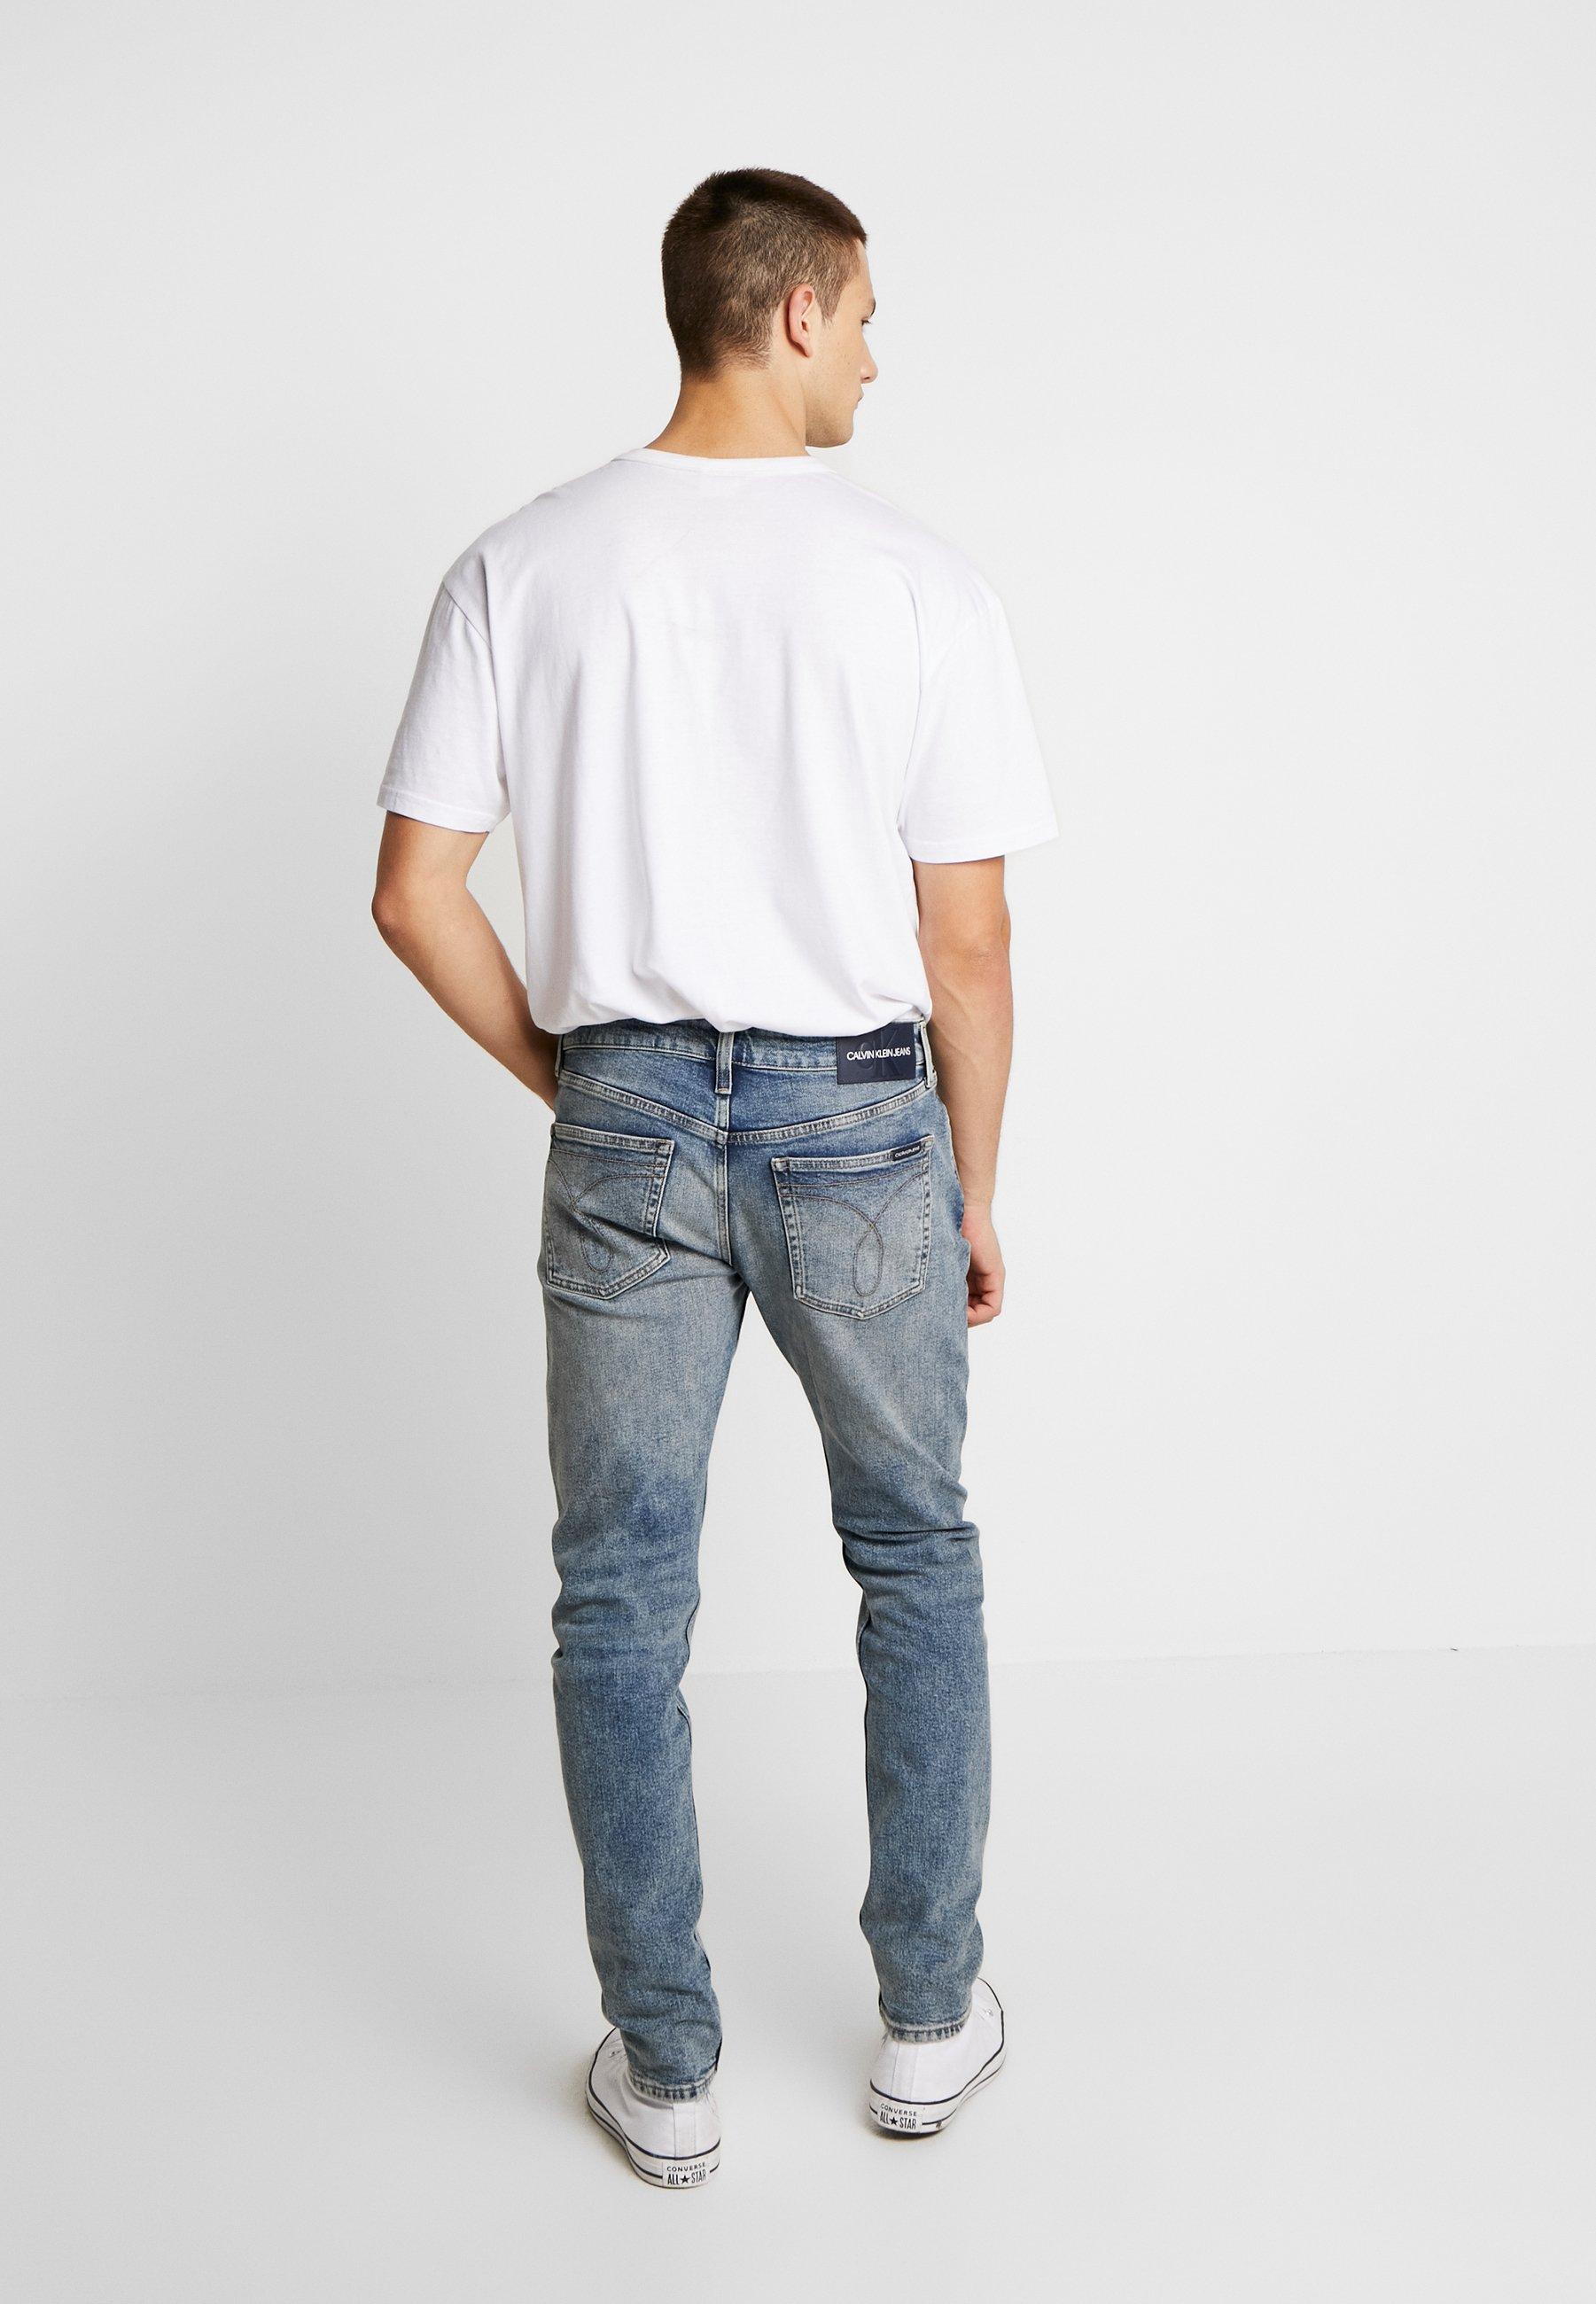 Calvin Klein Jeans Ckj 058 Slim Taper - Tapered Fit Bright Blue